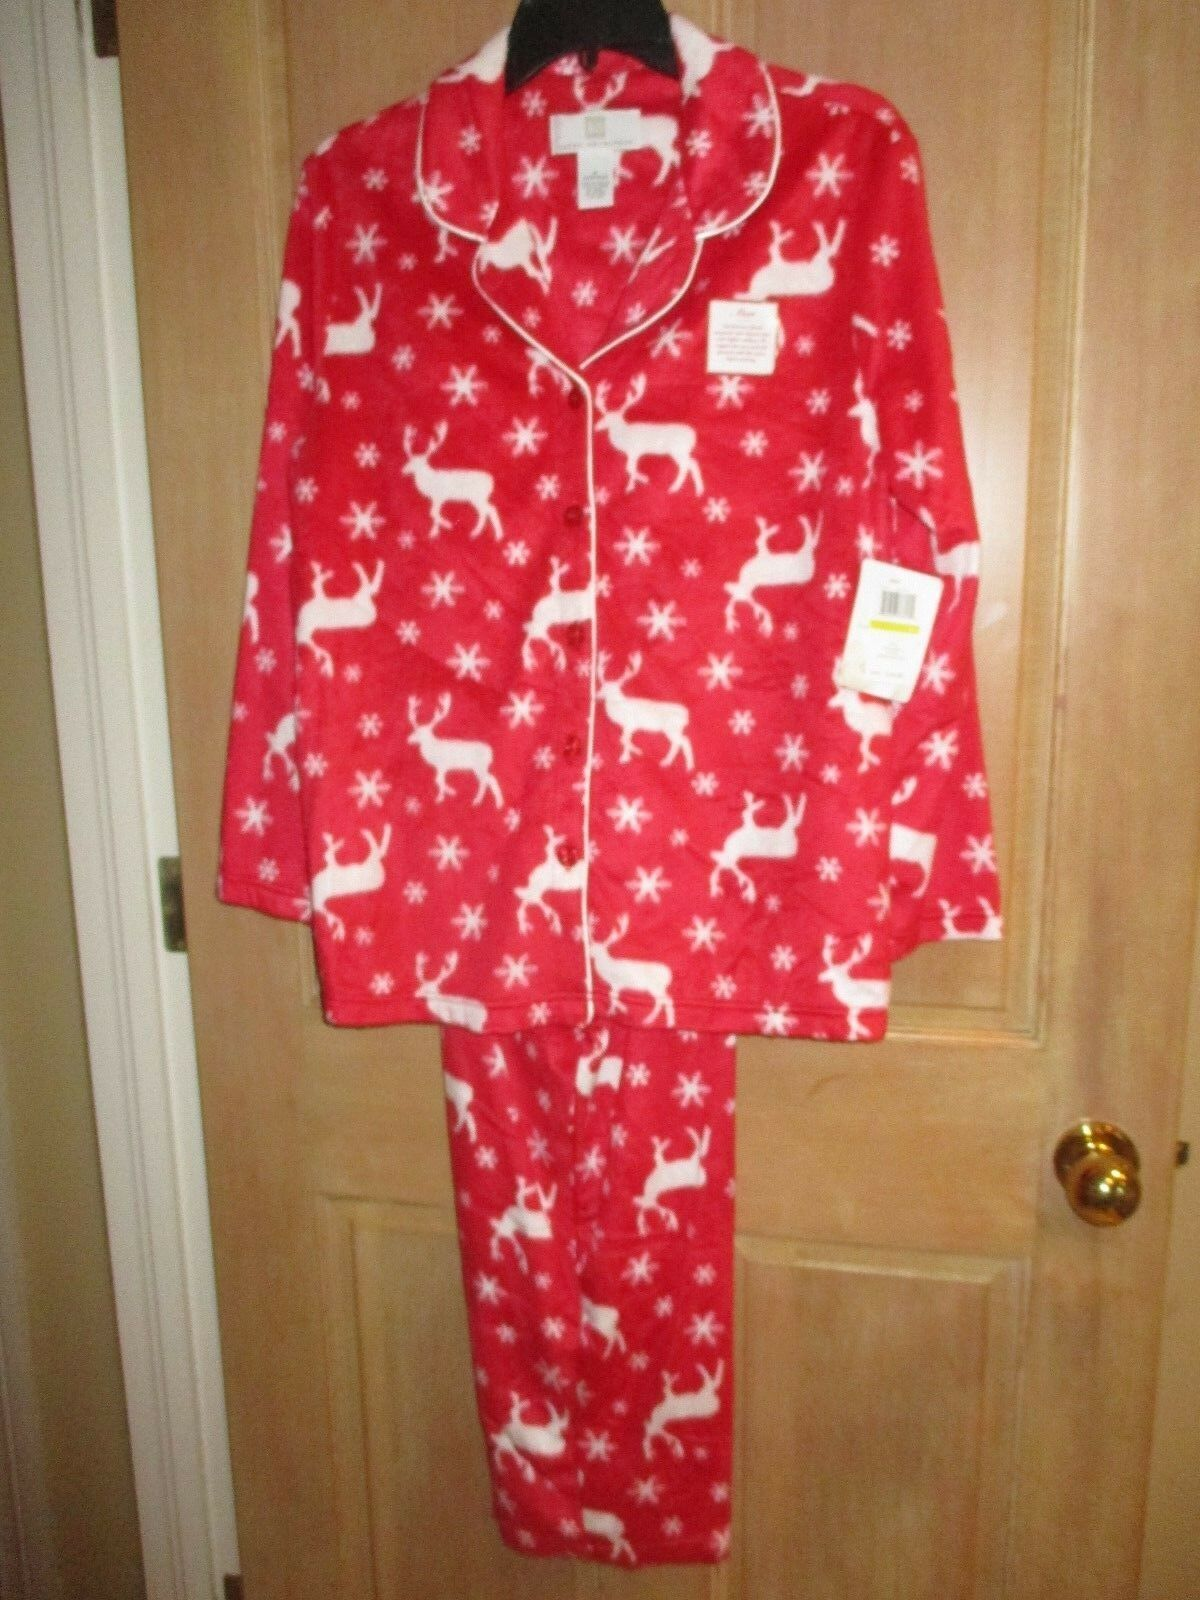 NEW KAREN NEUBURGER 1X FLEECE Pajamas L S PJ's LONG PANTS Red Snowflakes Deer